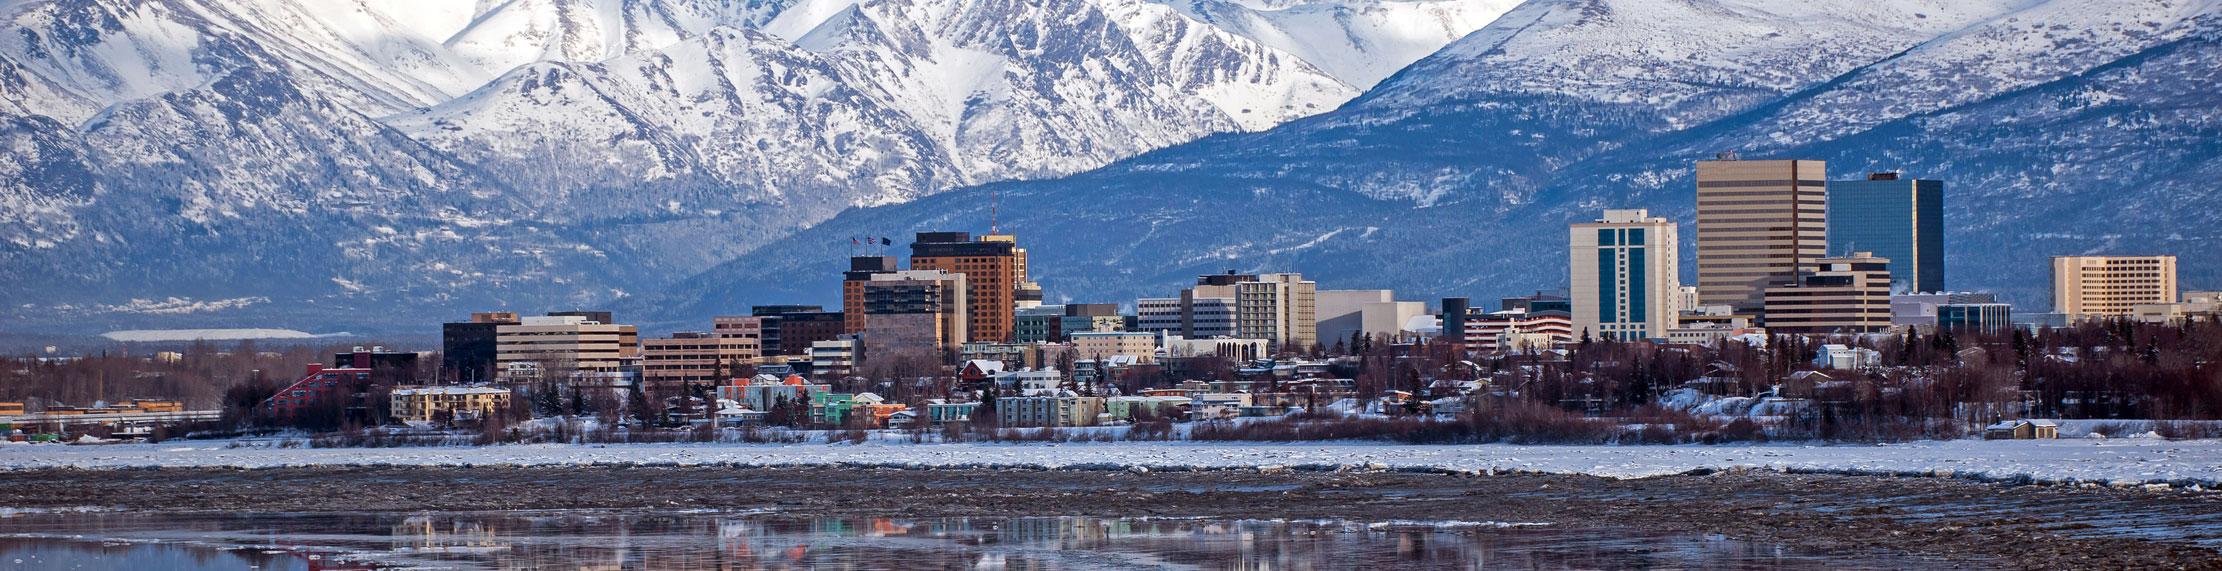 Downtown Anchorage Alaska with mountain backdrop.